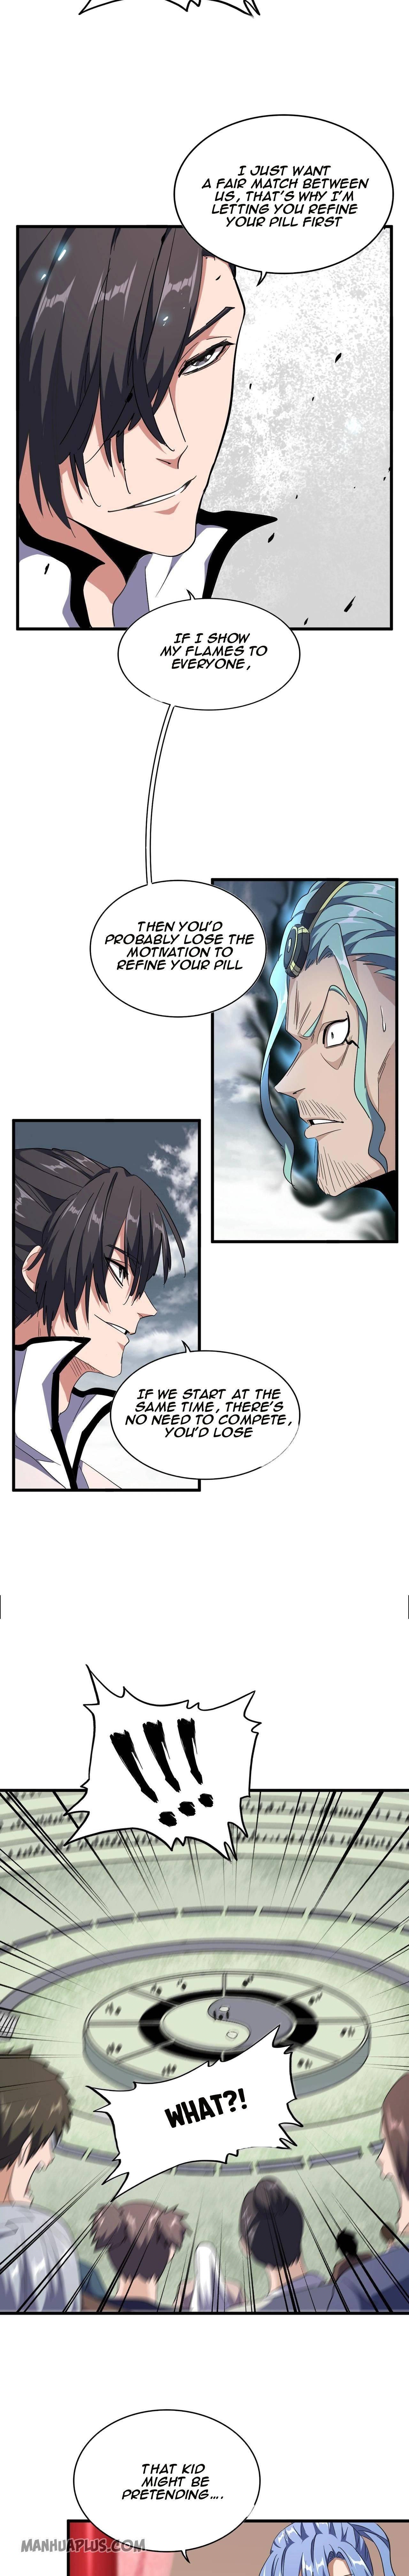 Manga Magic Emperor - Chapter 180 Page 1